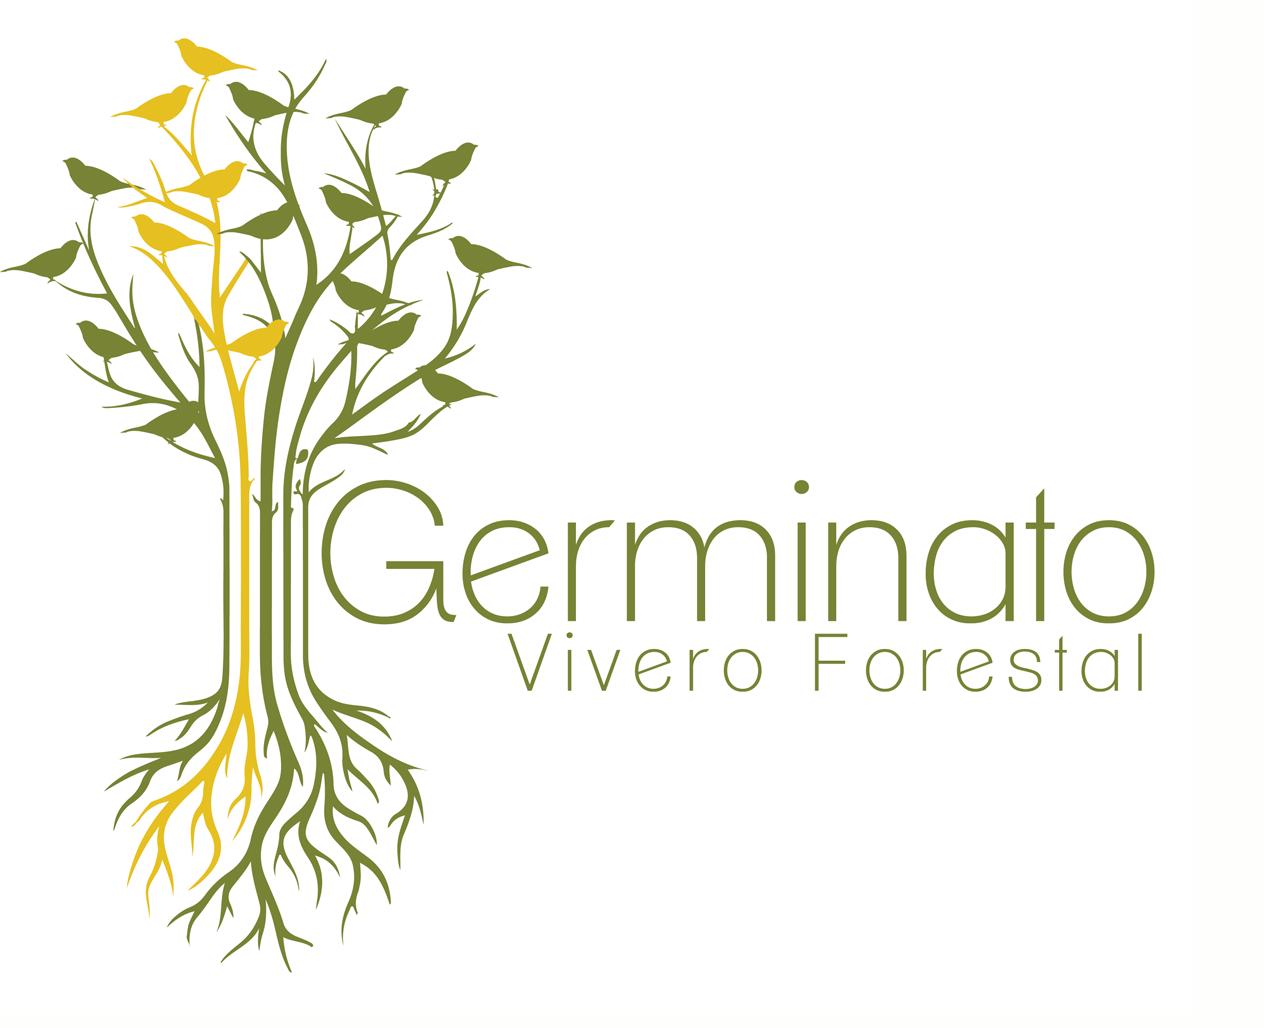 GERMINATO Vivero Forestal